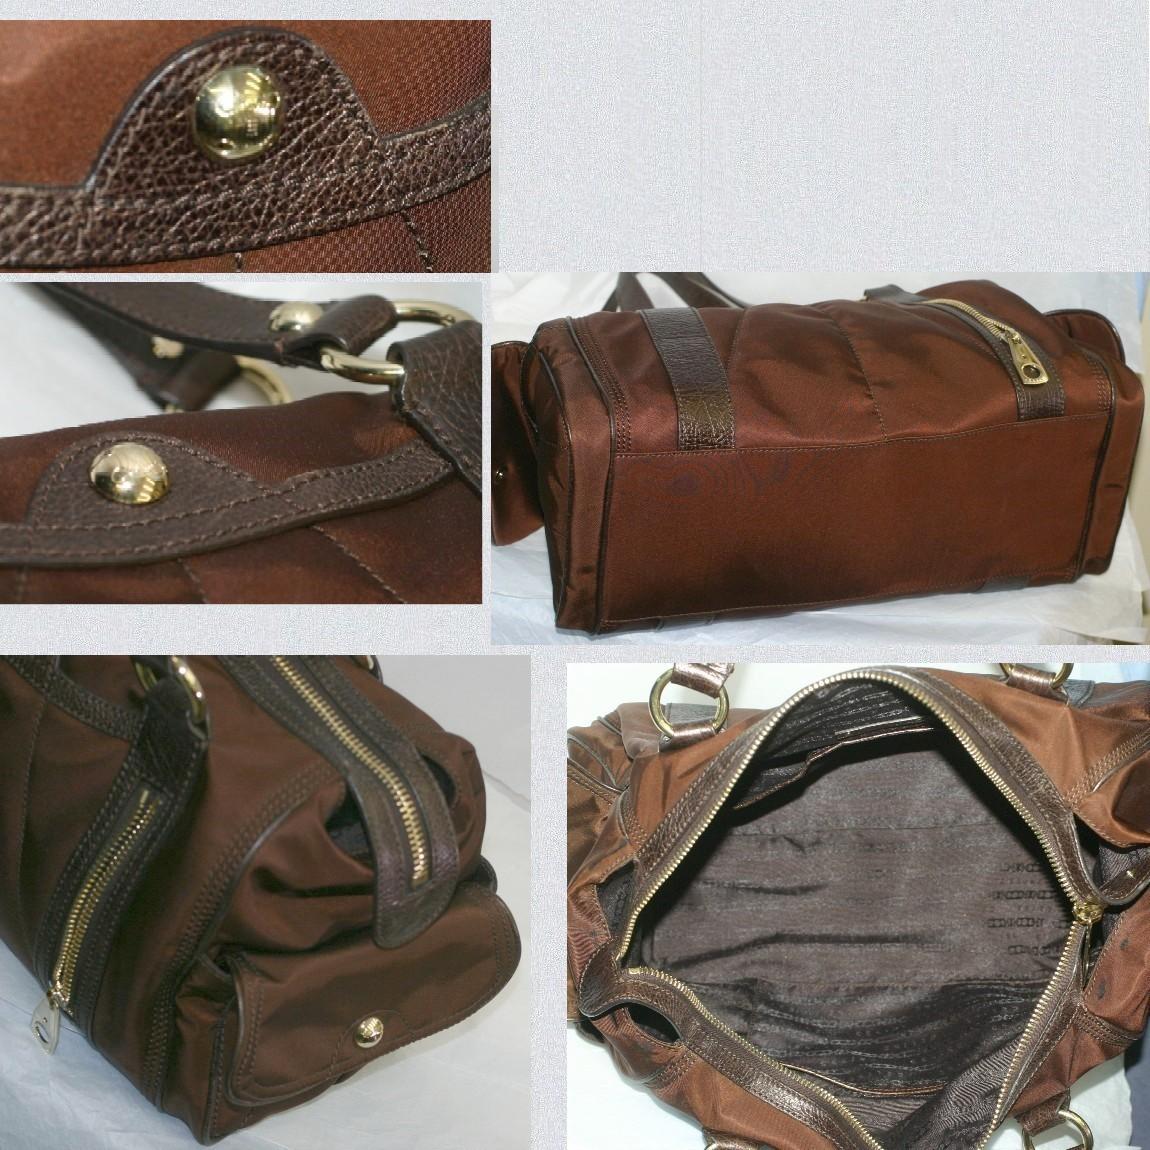 0619ea1560bf セリーヌの女性用の軽いナイロンキャンバス素材に革を使用しているボストンバッグの出品です。サイズはW41H21D16,5cmで幅2,5cmの革素材の持ち手の長さは40cm位で付属品  ...